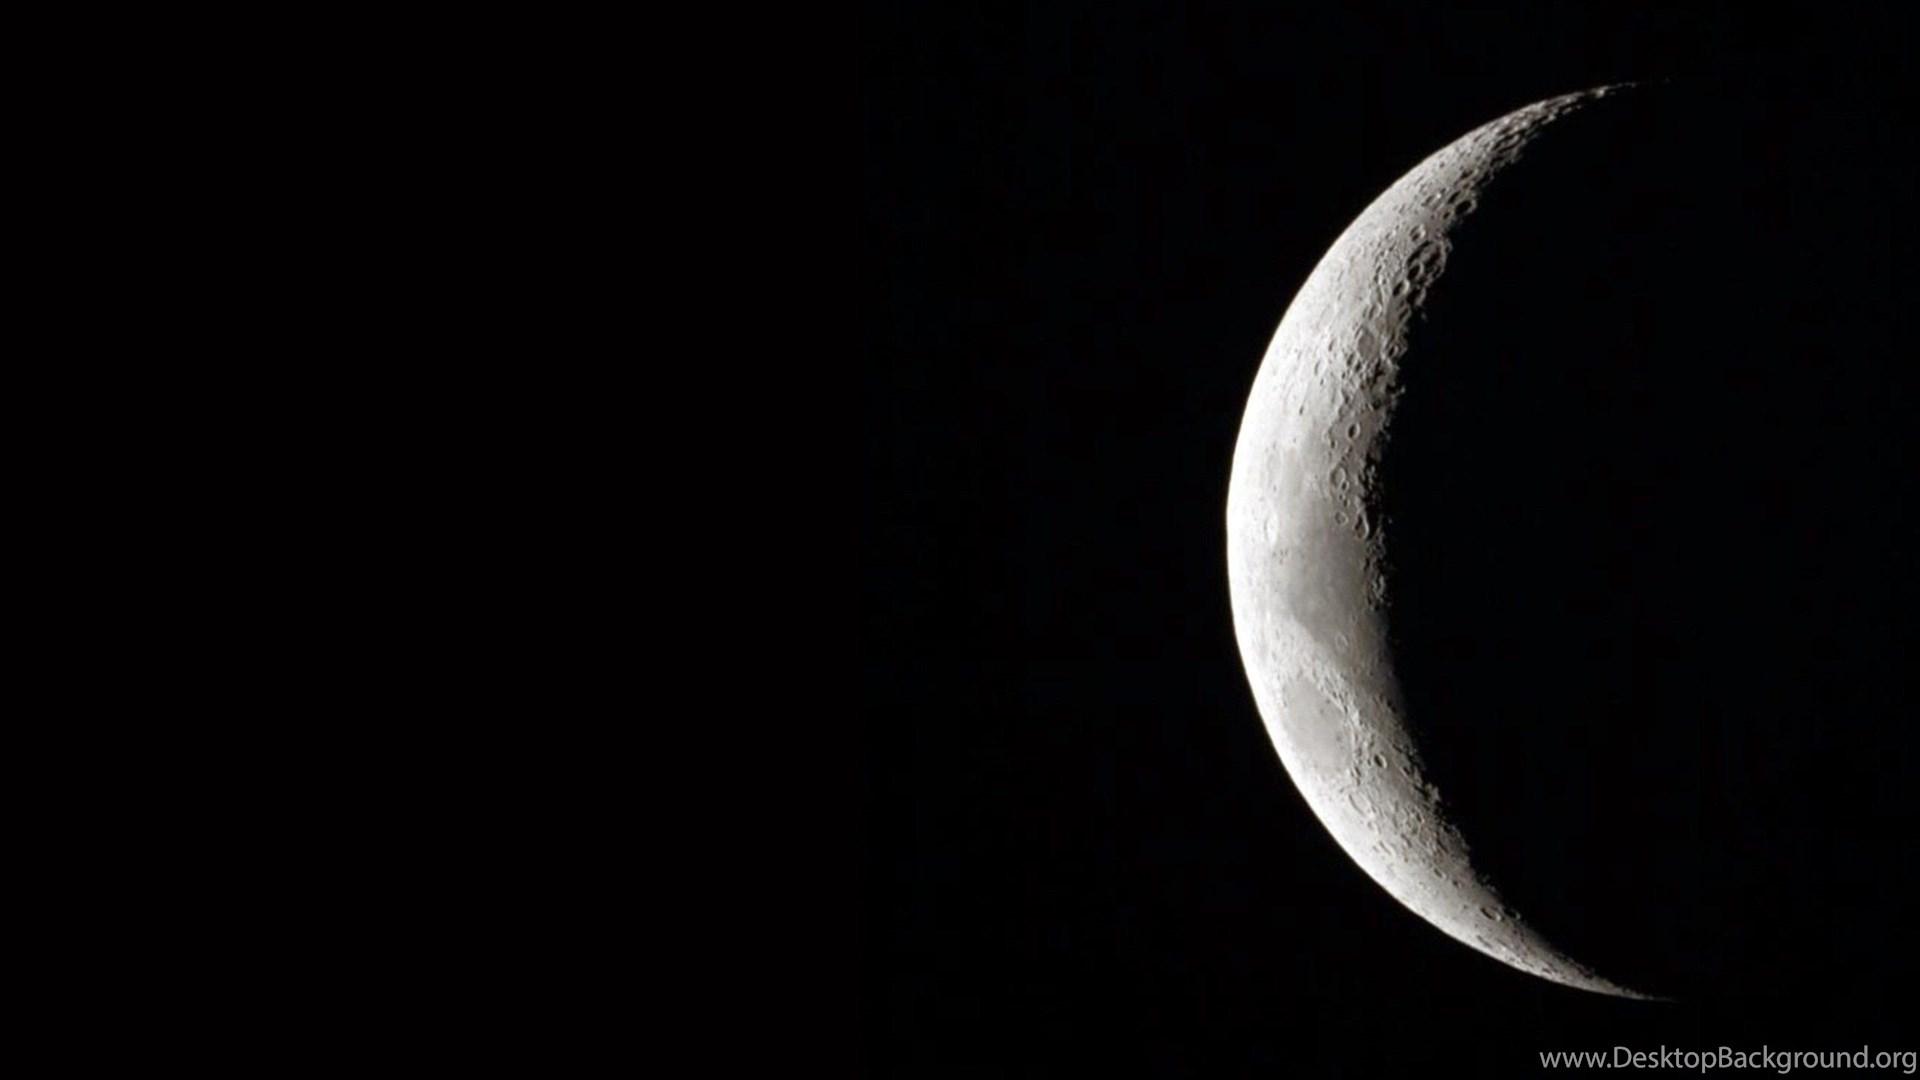 Dark Side Of The Moon Wallpaper 1920x1080